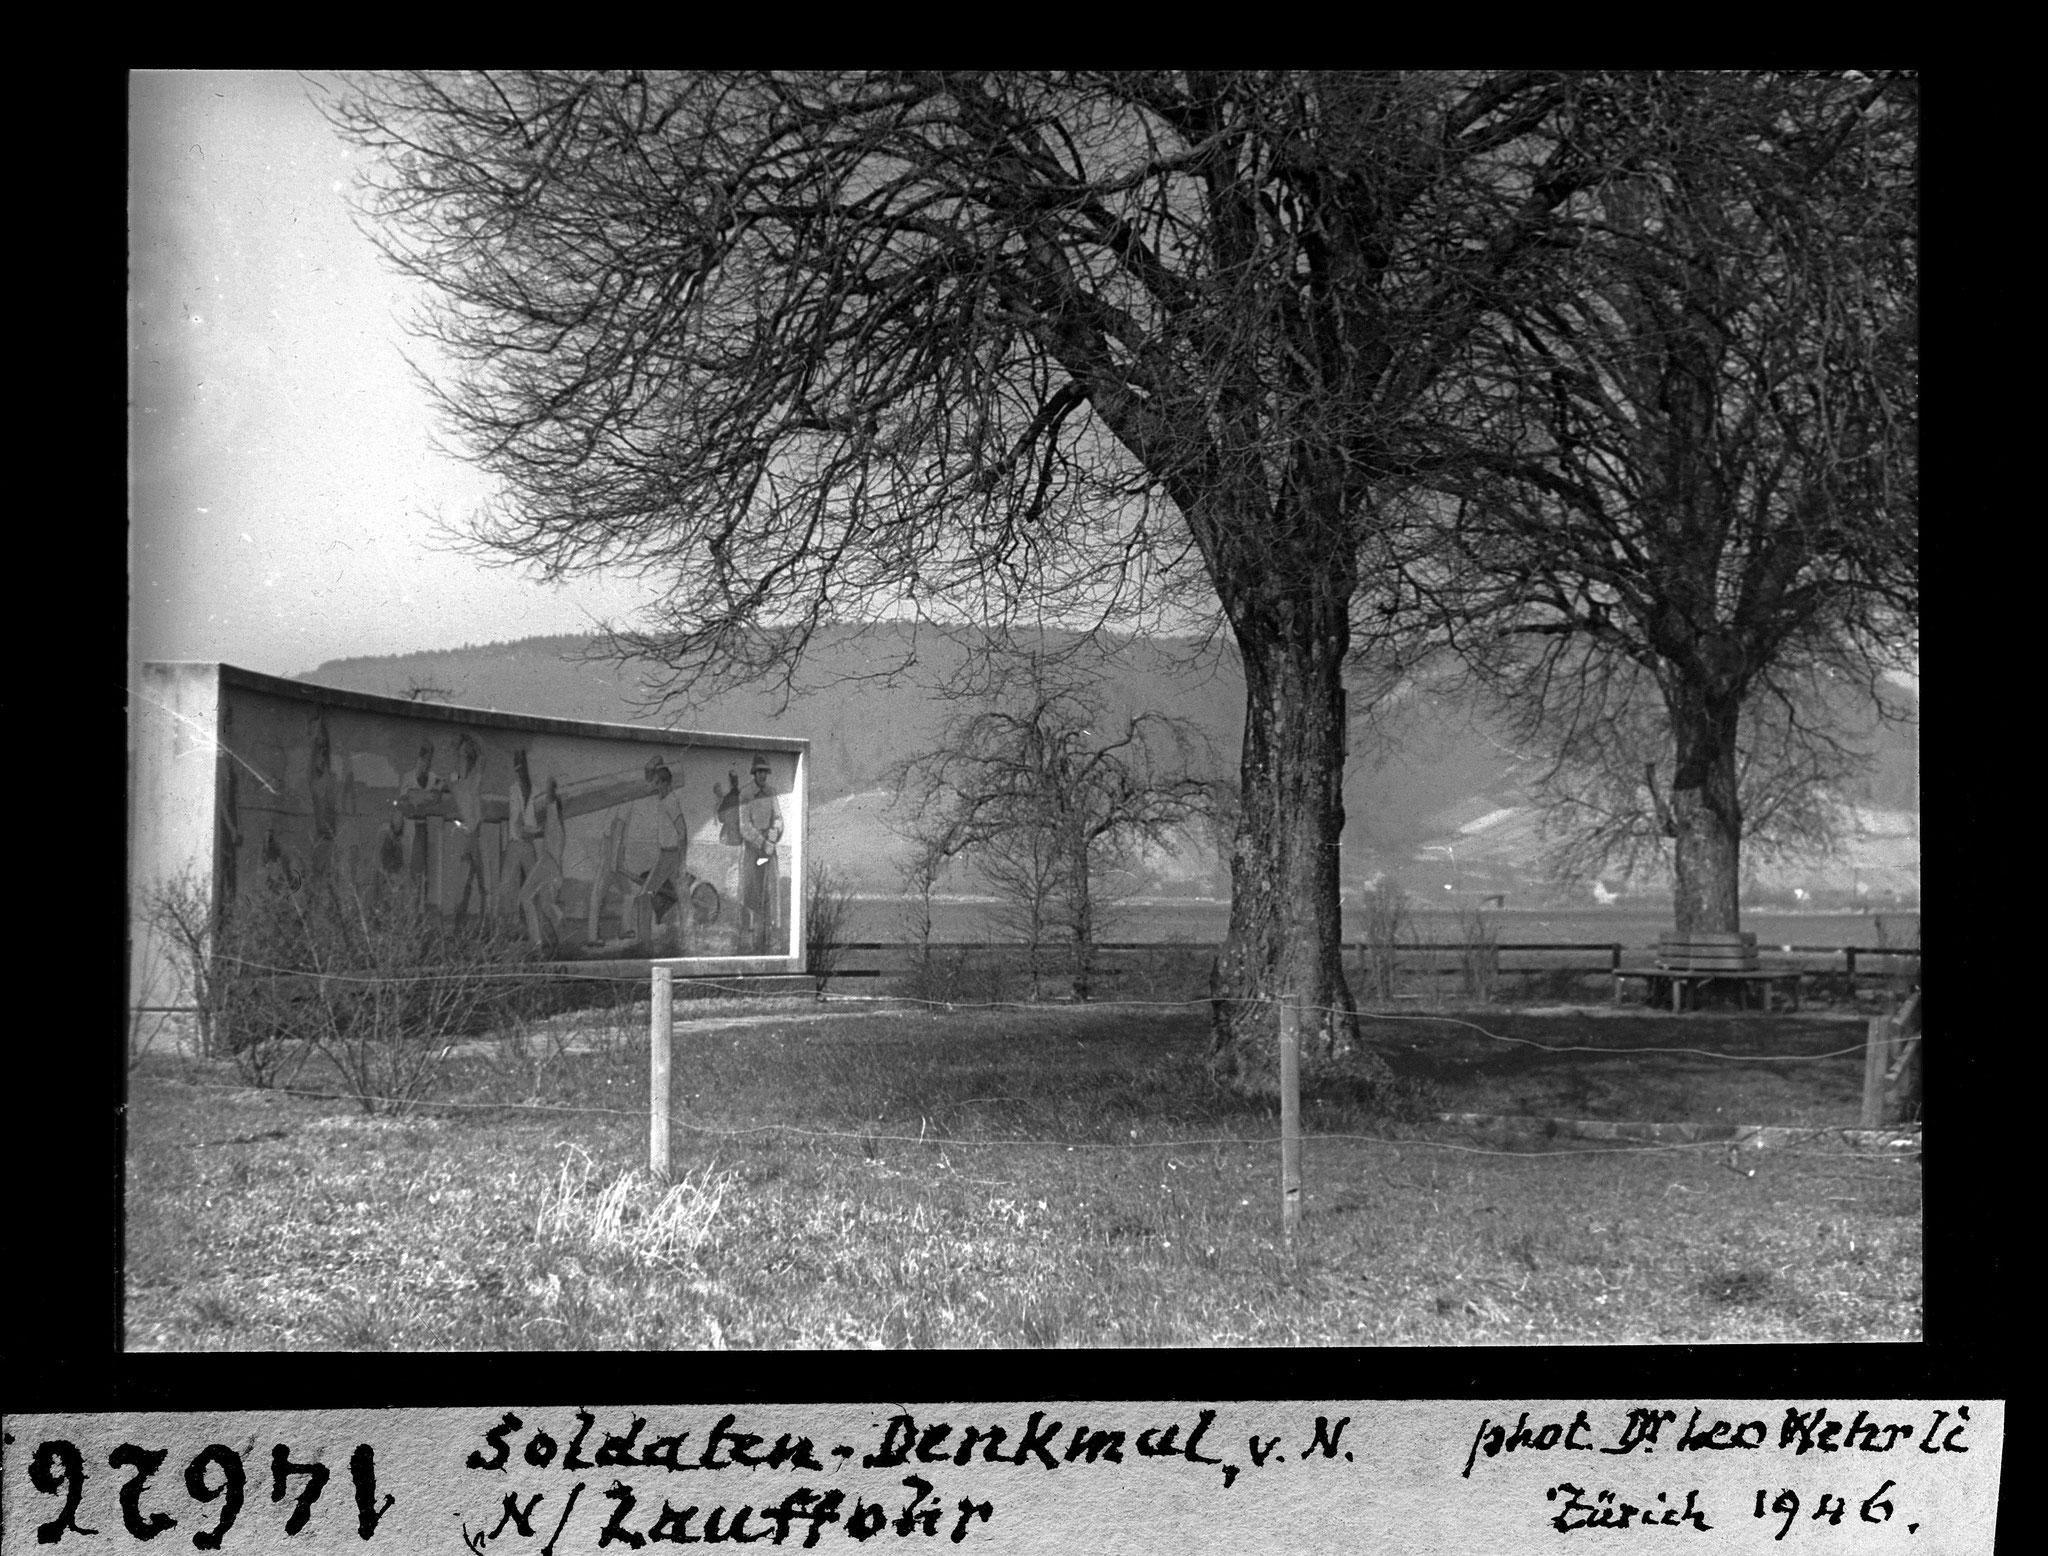 1946 - Soldatendenkmal Lauffohr (Quelle: ETH-Bibliothek, e-pics.ethz.ch)